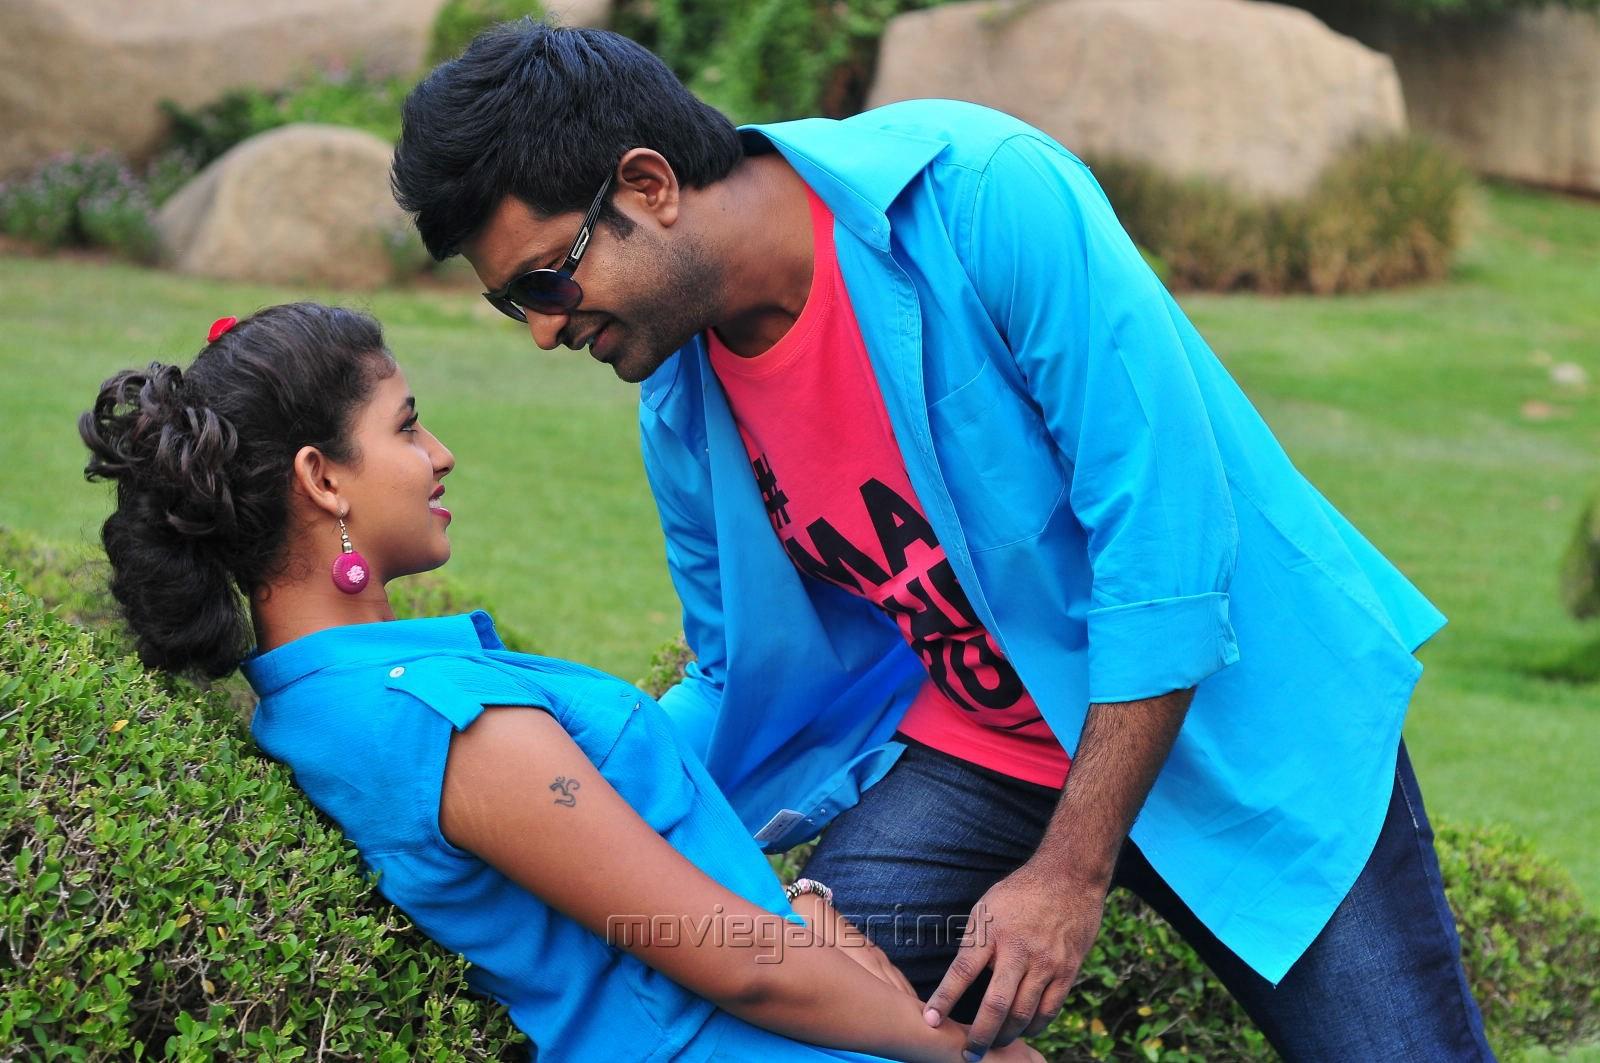 Abhimanyudu Movie Telugu Download Hd: New Release Movies On Dvd Feb